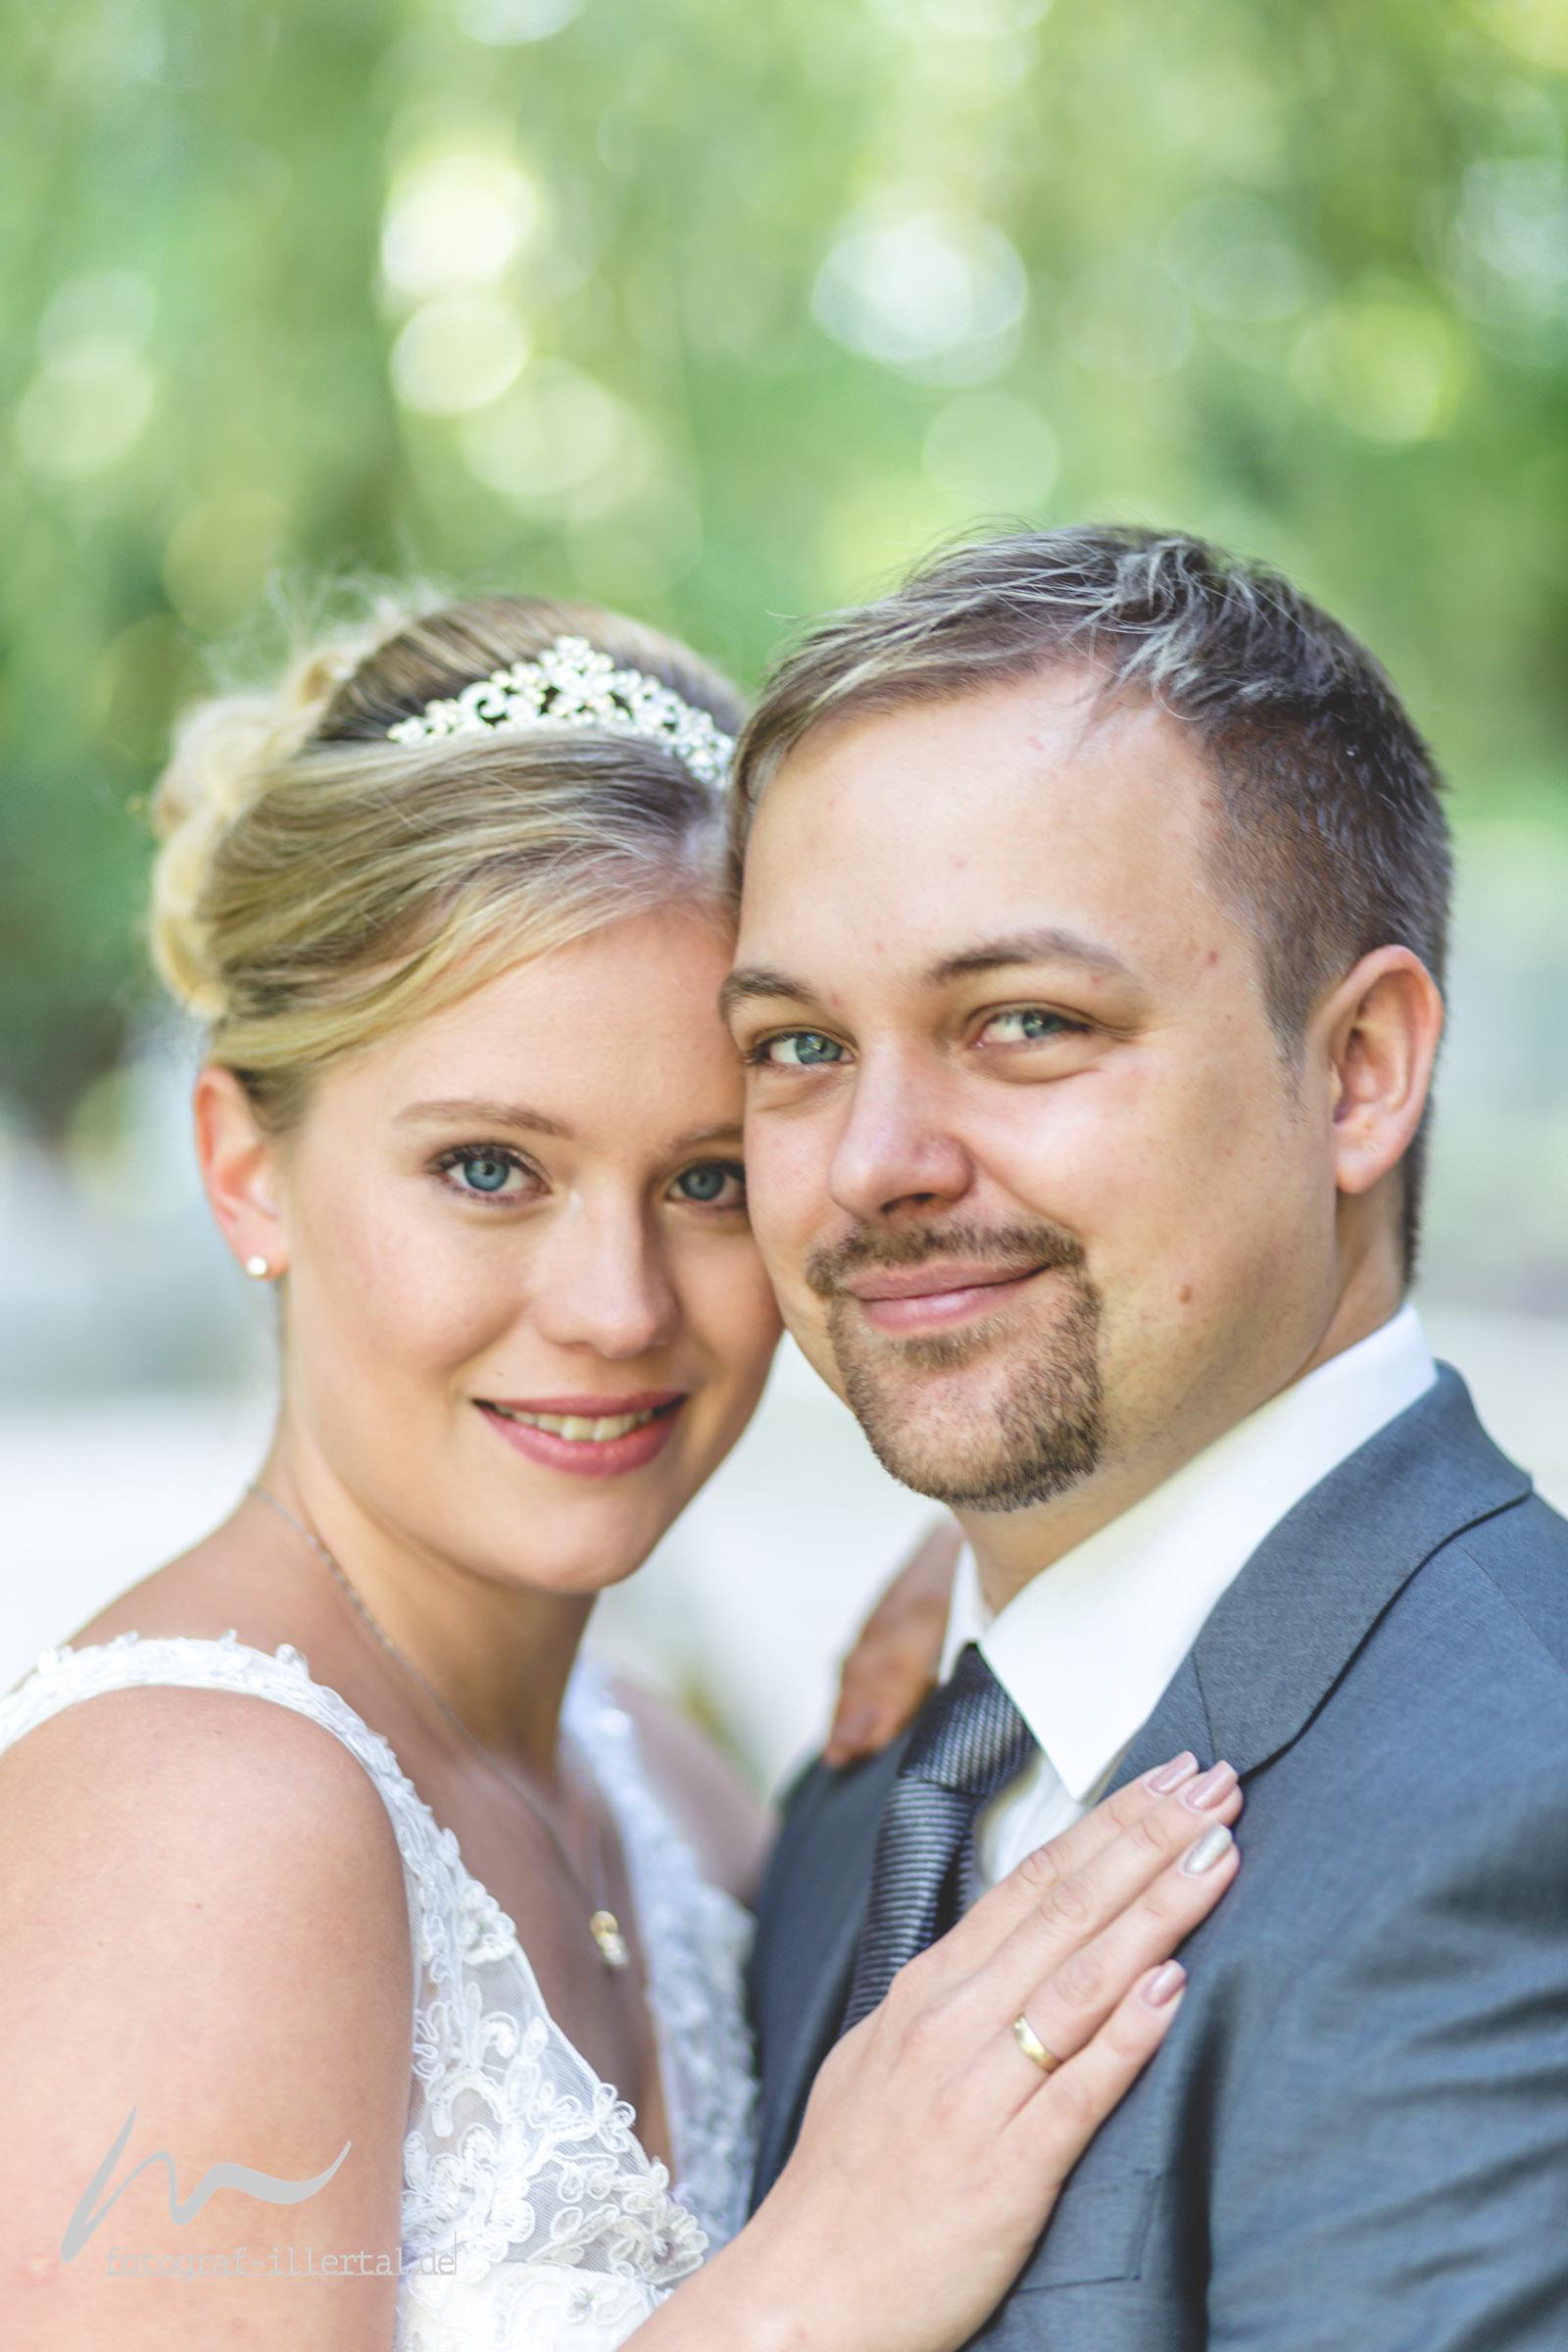 Fotograf Illertal-Christian Miller-Hochzeitsfotografie-_MG_8459